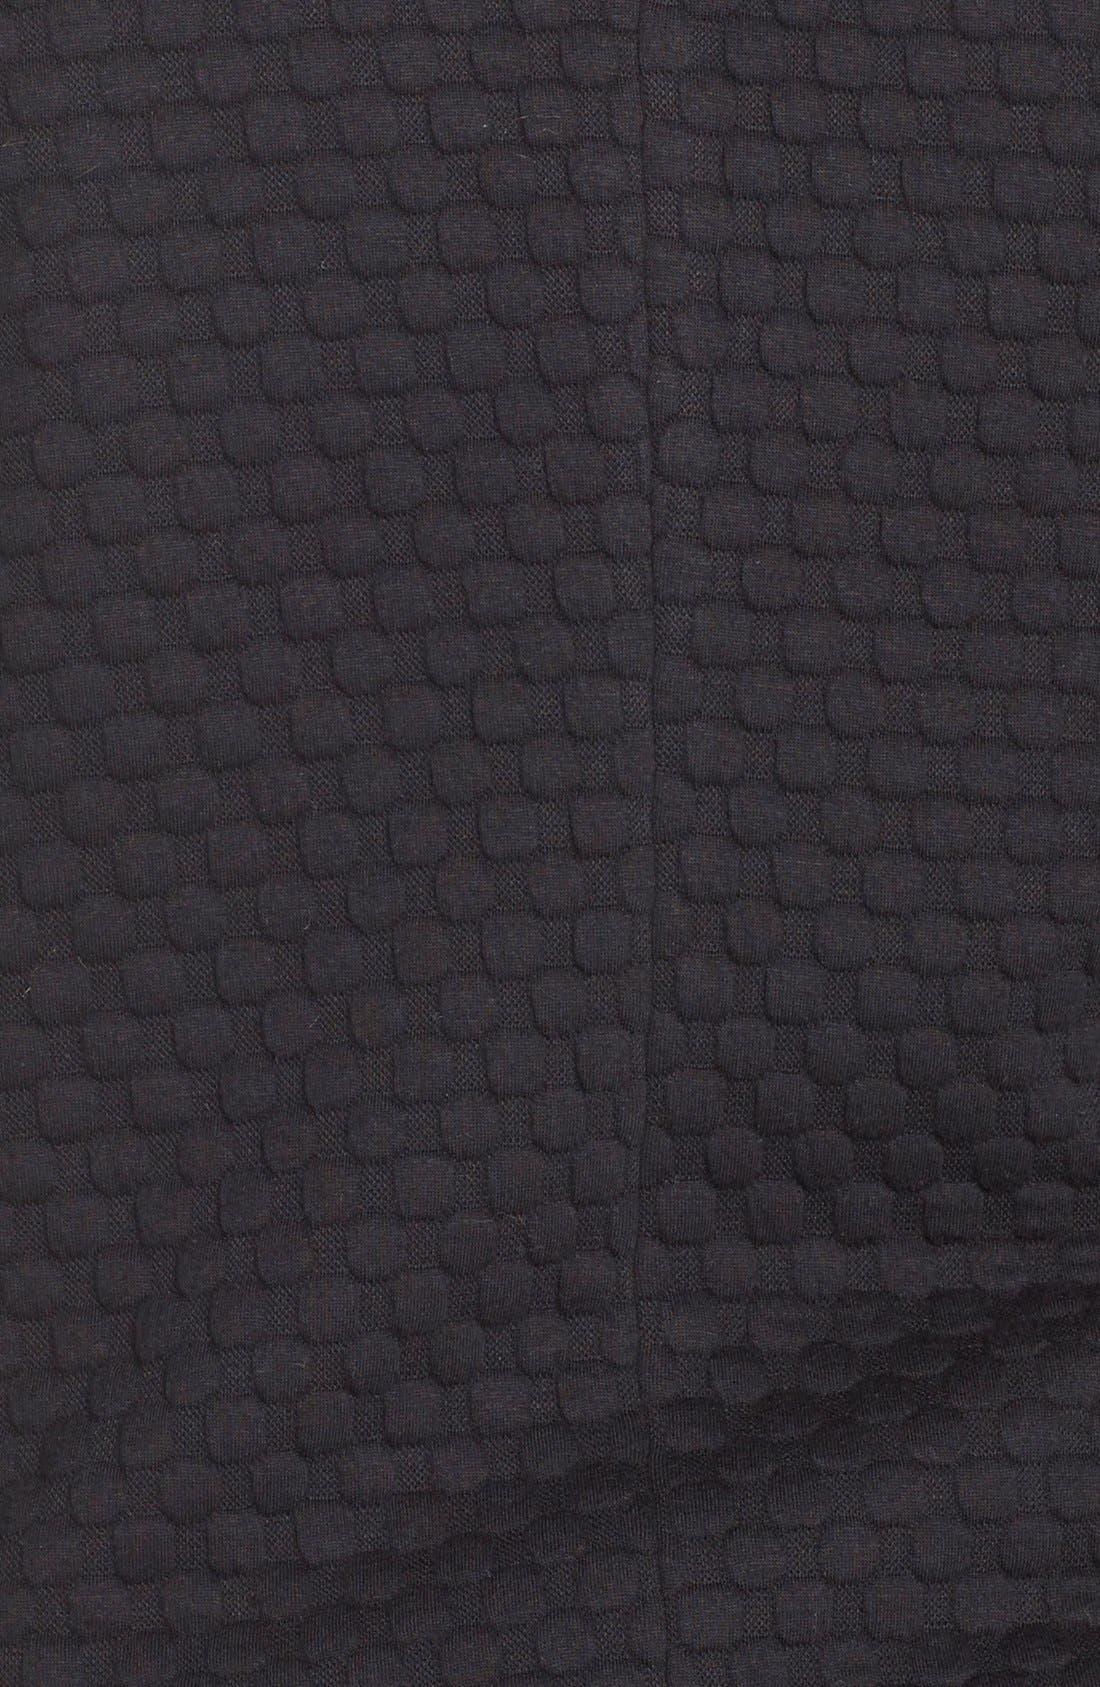 'Bridgette' Textured KnitJacket,                             Alternate thumbnail 3, color,                             Black Bubble